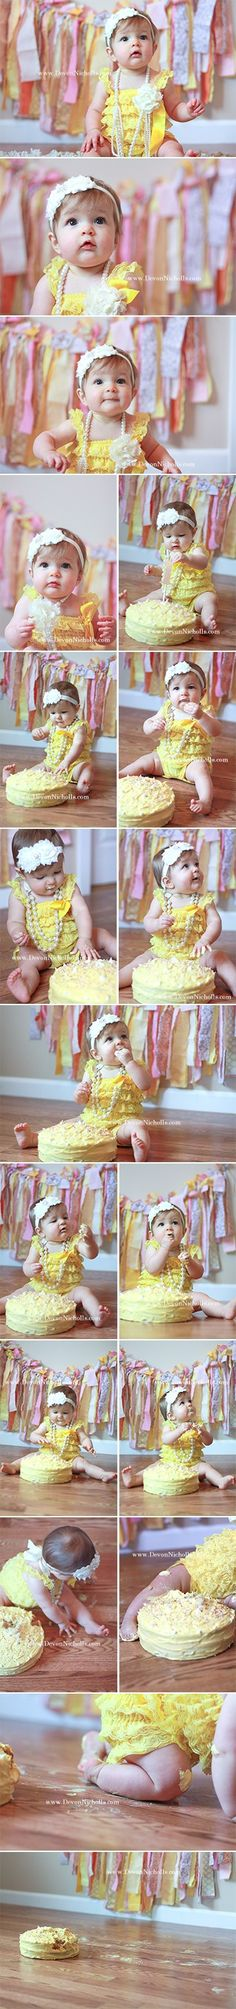 cake smash photo shoot, one year old, cake, baby girl, Devon Nicholls Photography